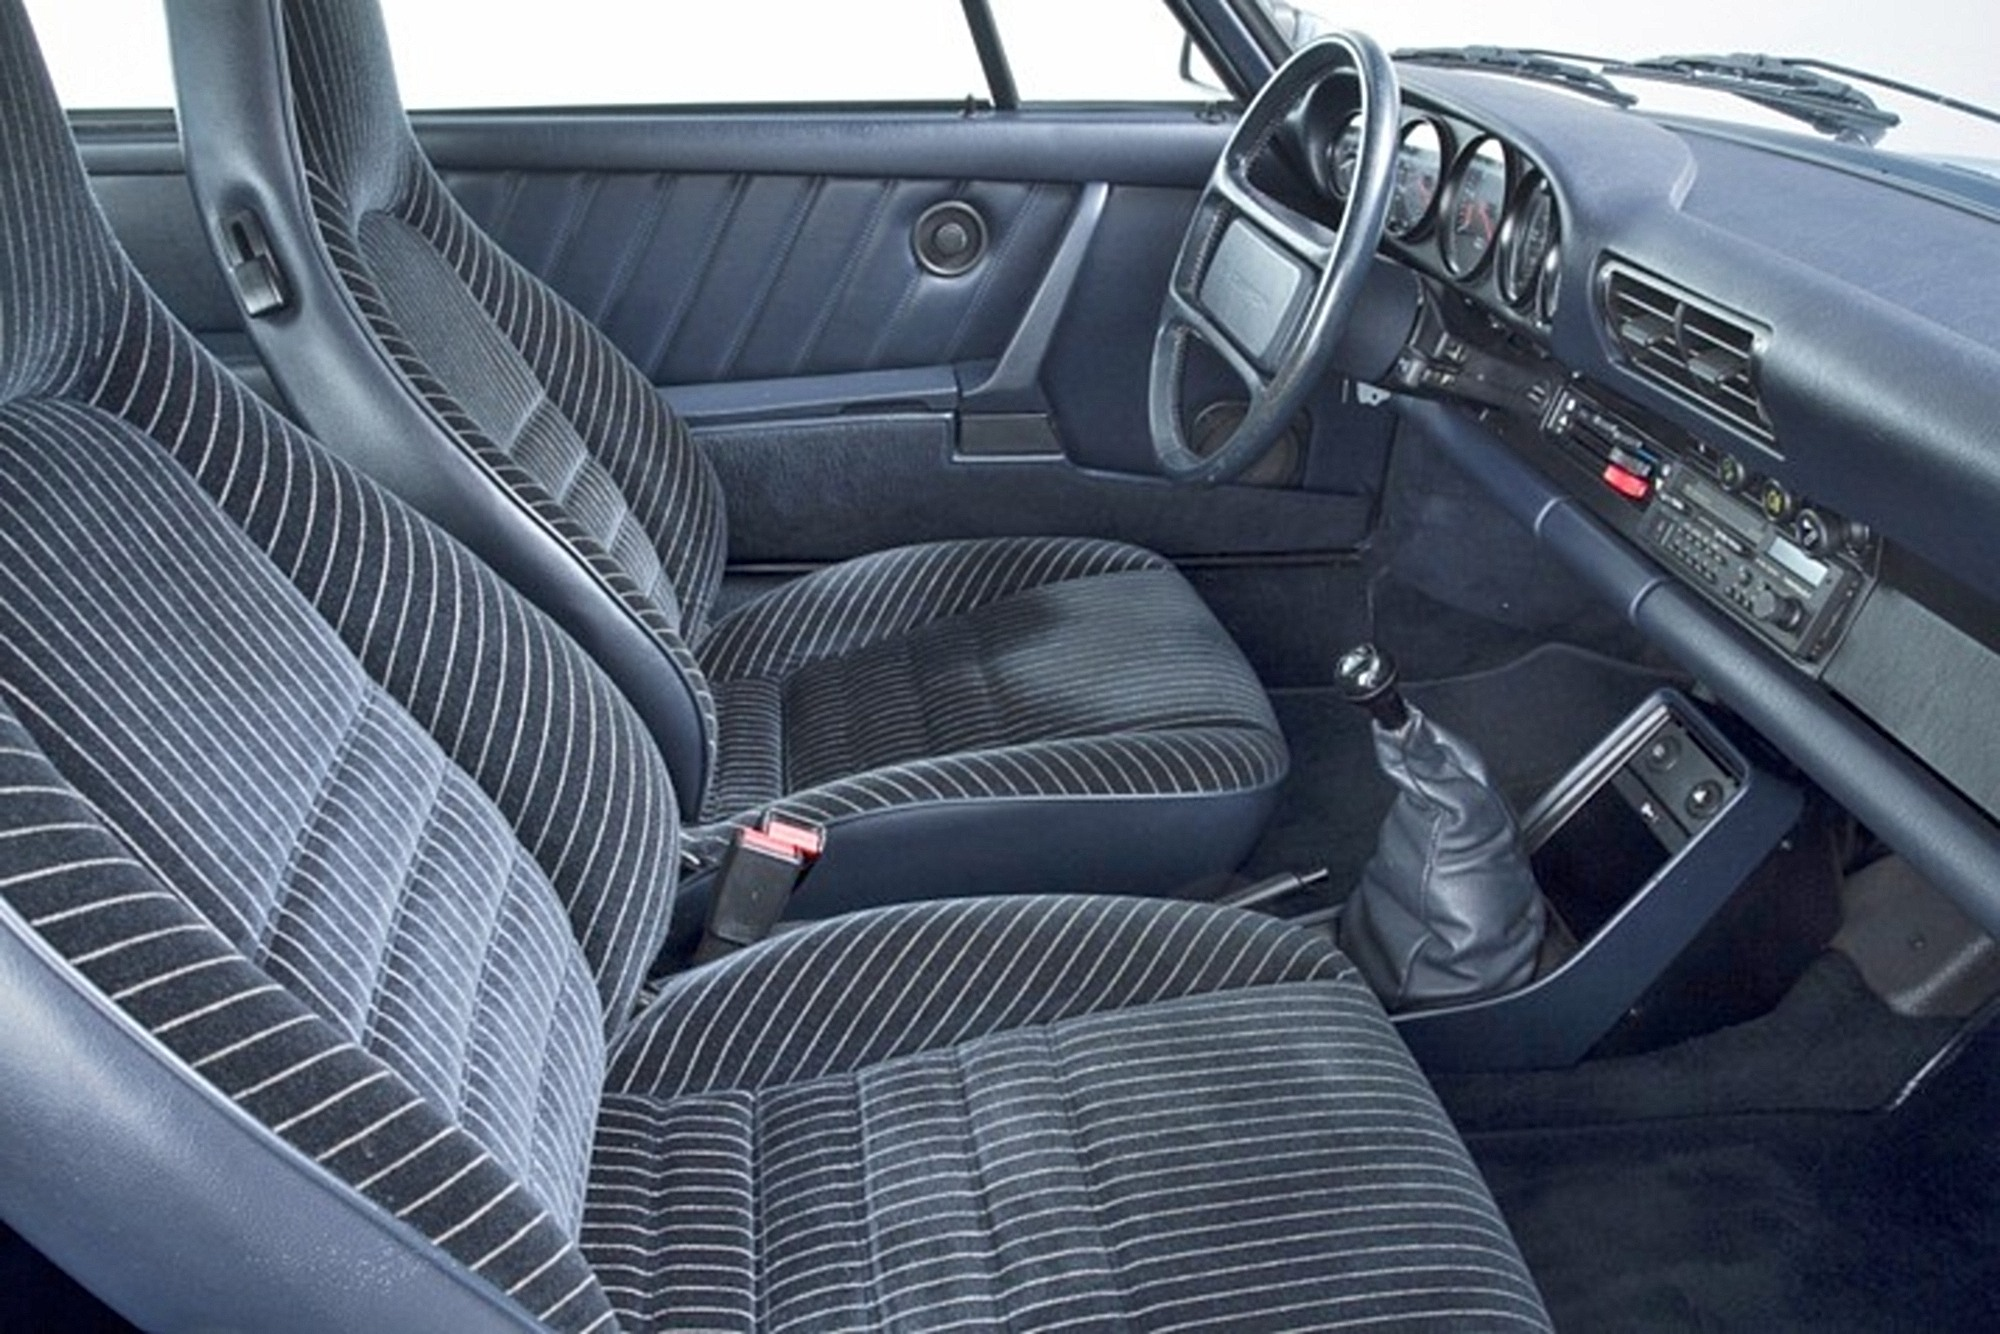 elferbase porsche 911 g modell lederschaltsack. Black Bedroom Furniture Sets. Home Design Ideas